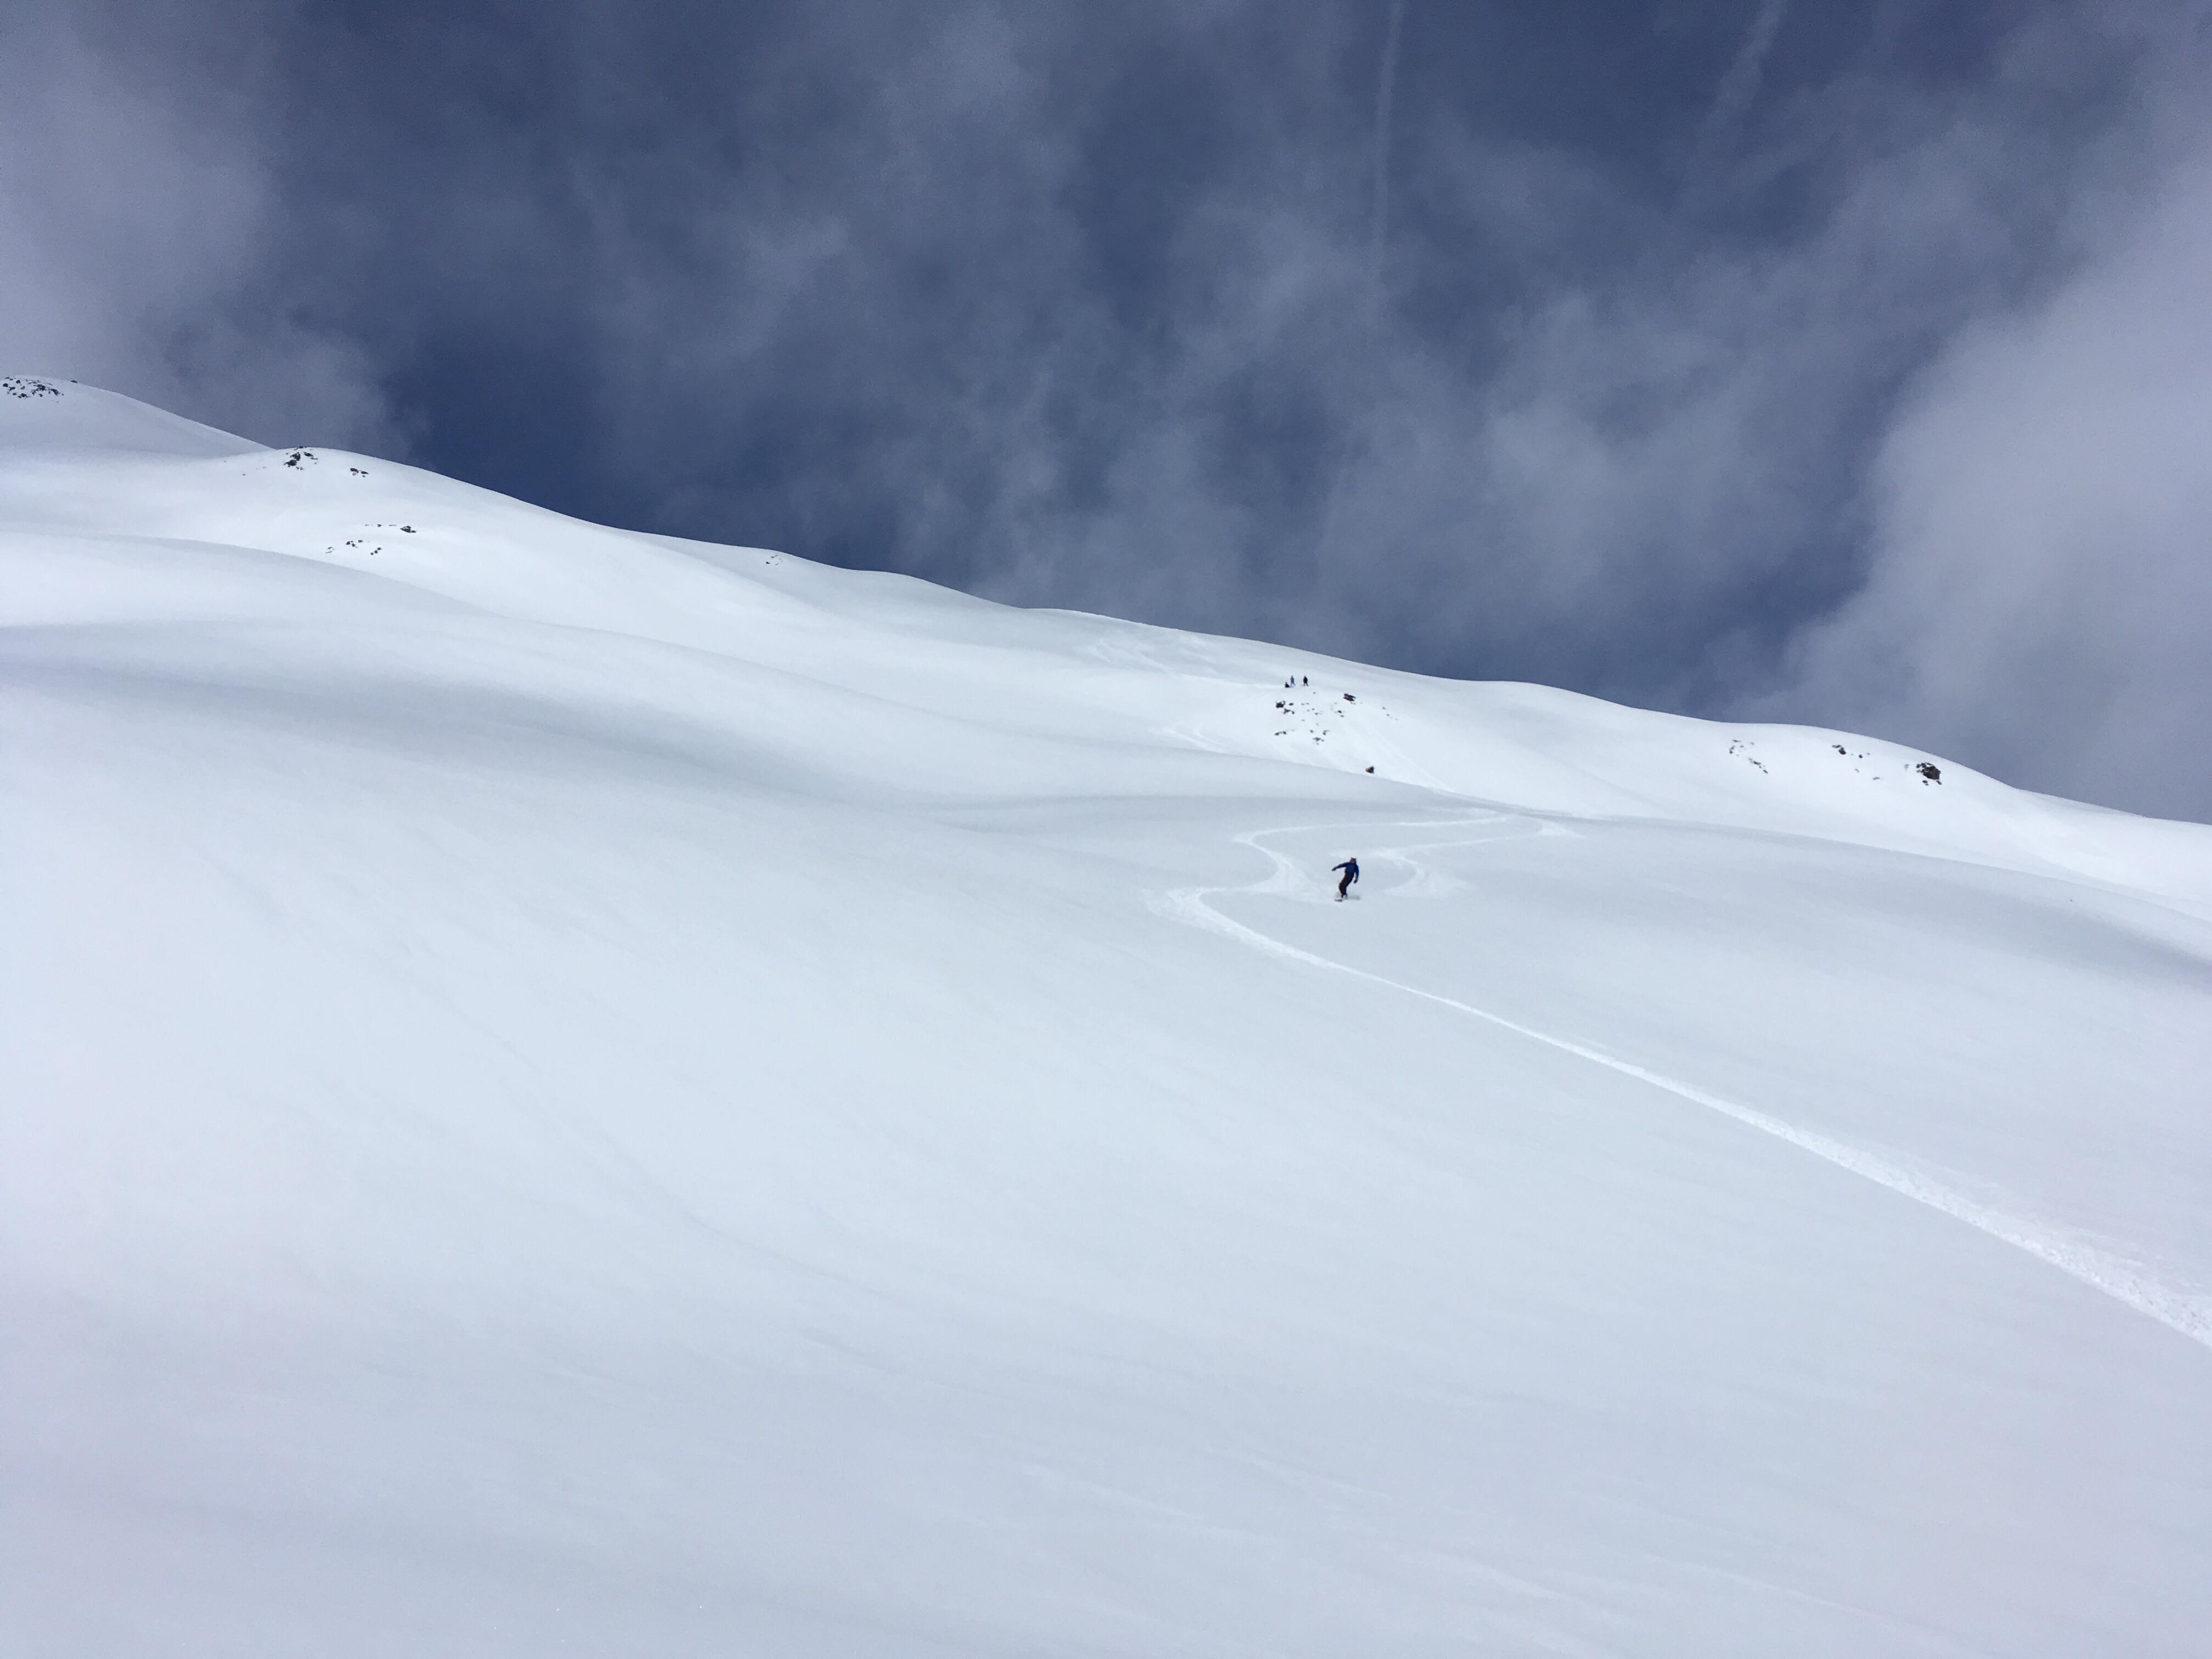 Col de la Louze snowboard 5